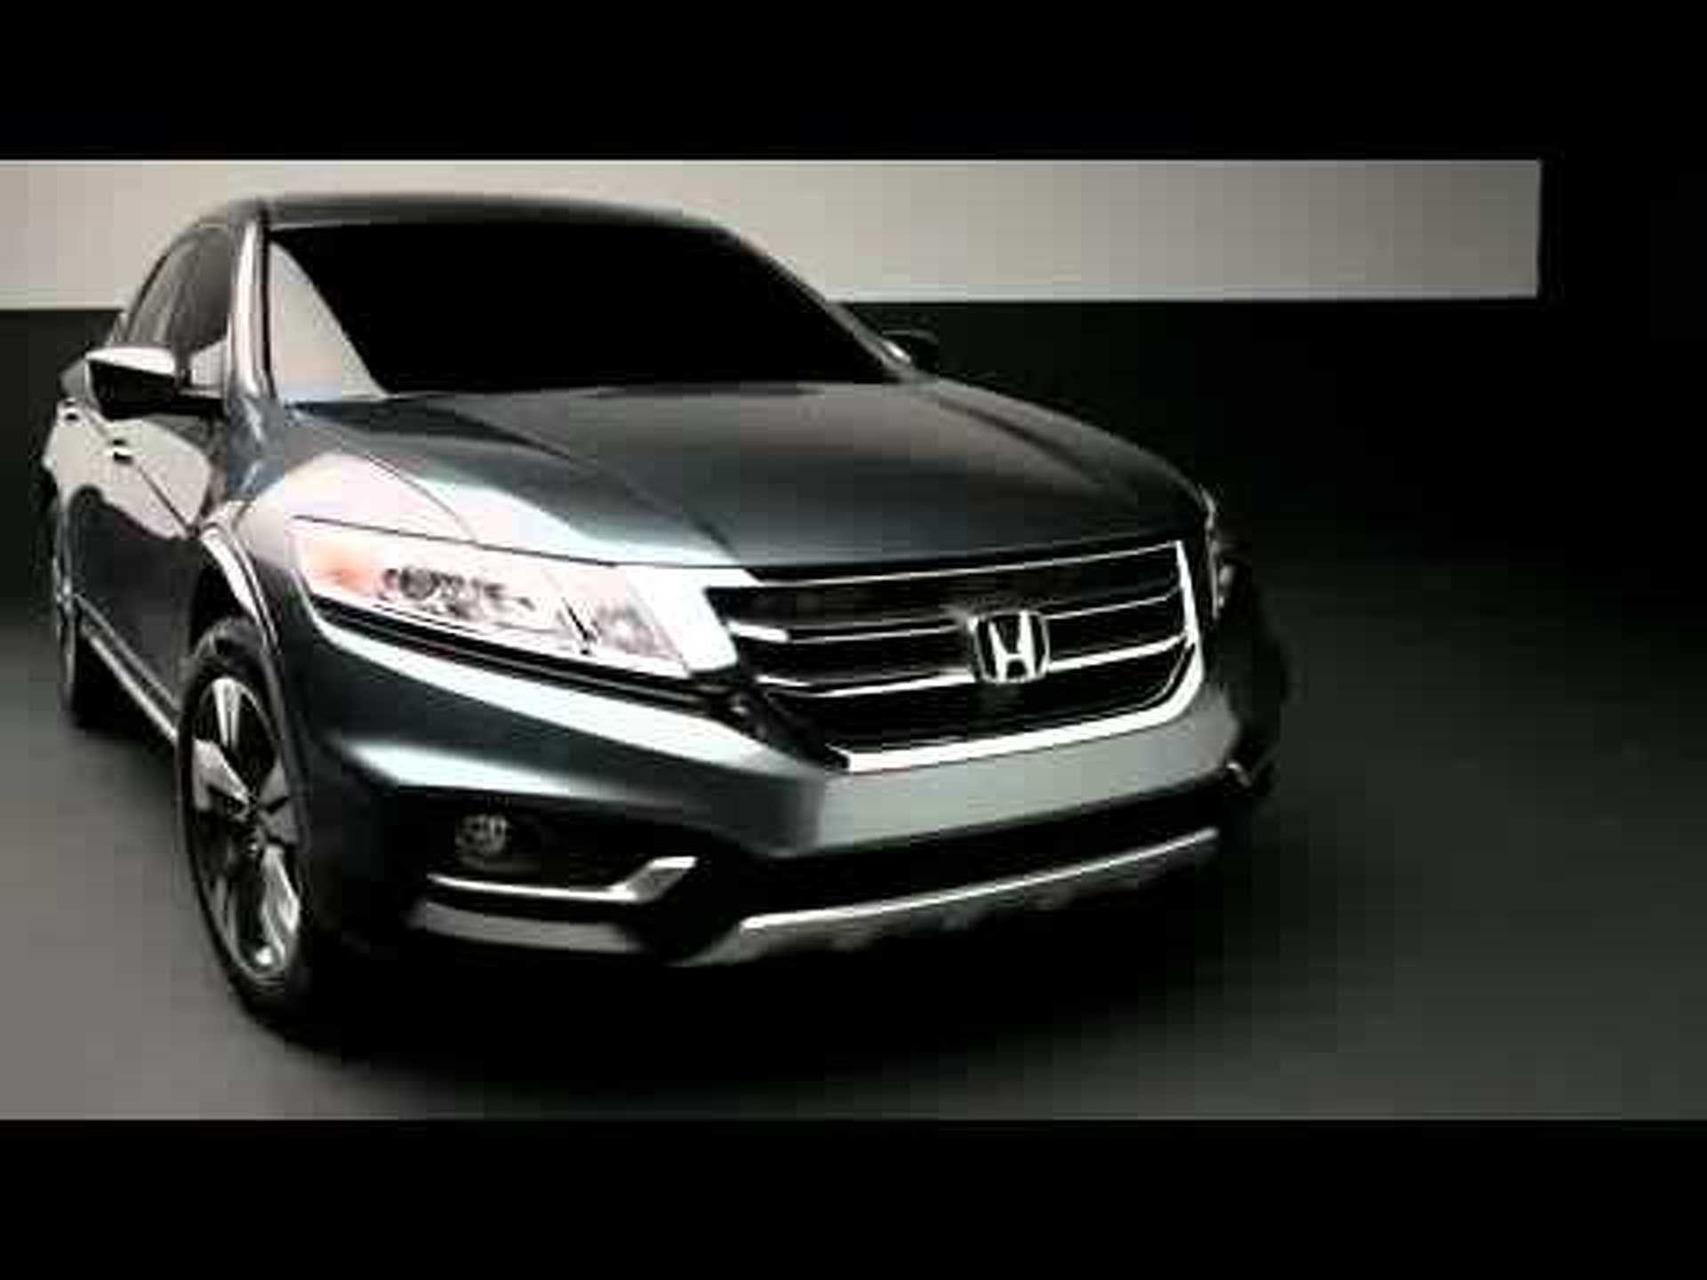 2013 Honda Crosstour Concept B-Roll